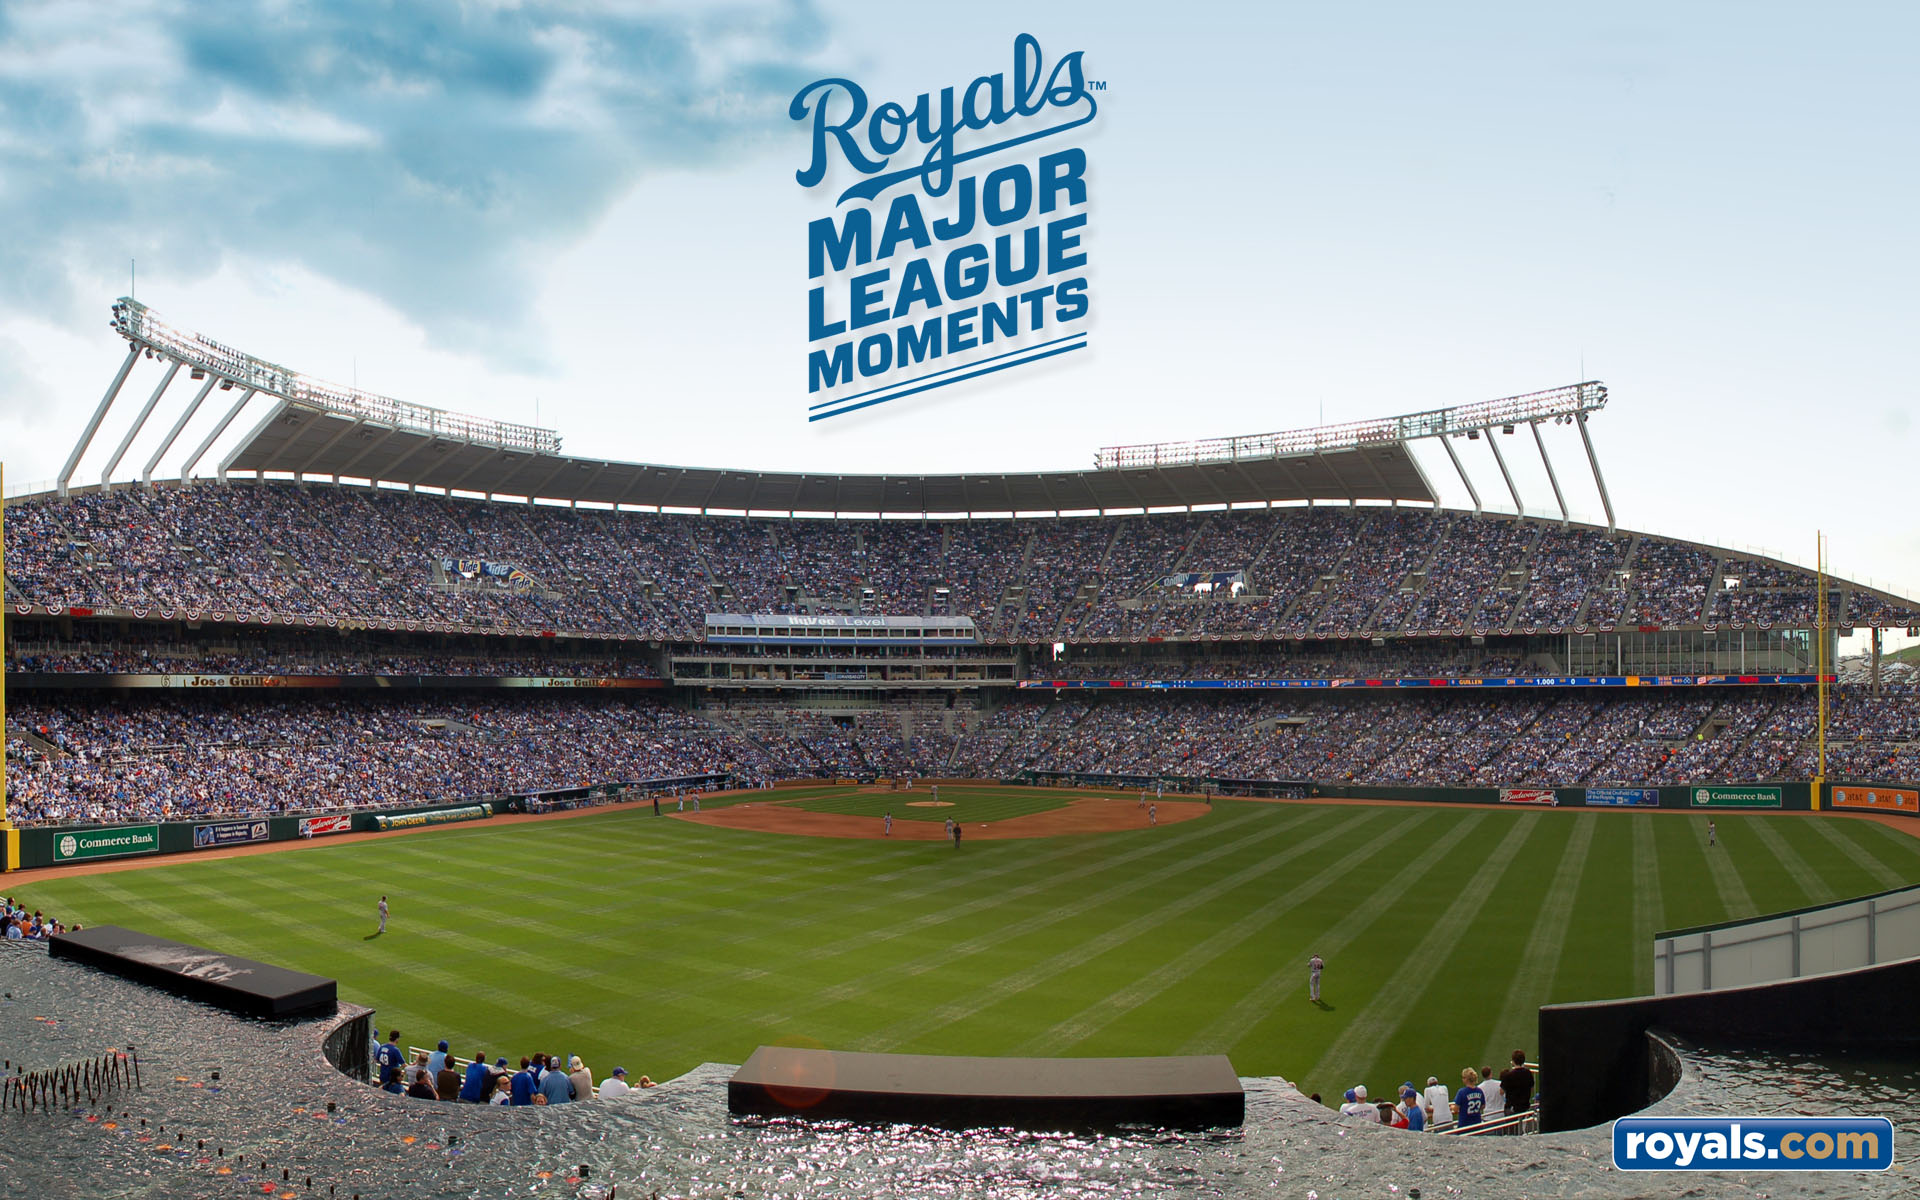 Royals 2011 Wallpapers 1920x1200